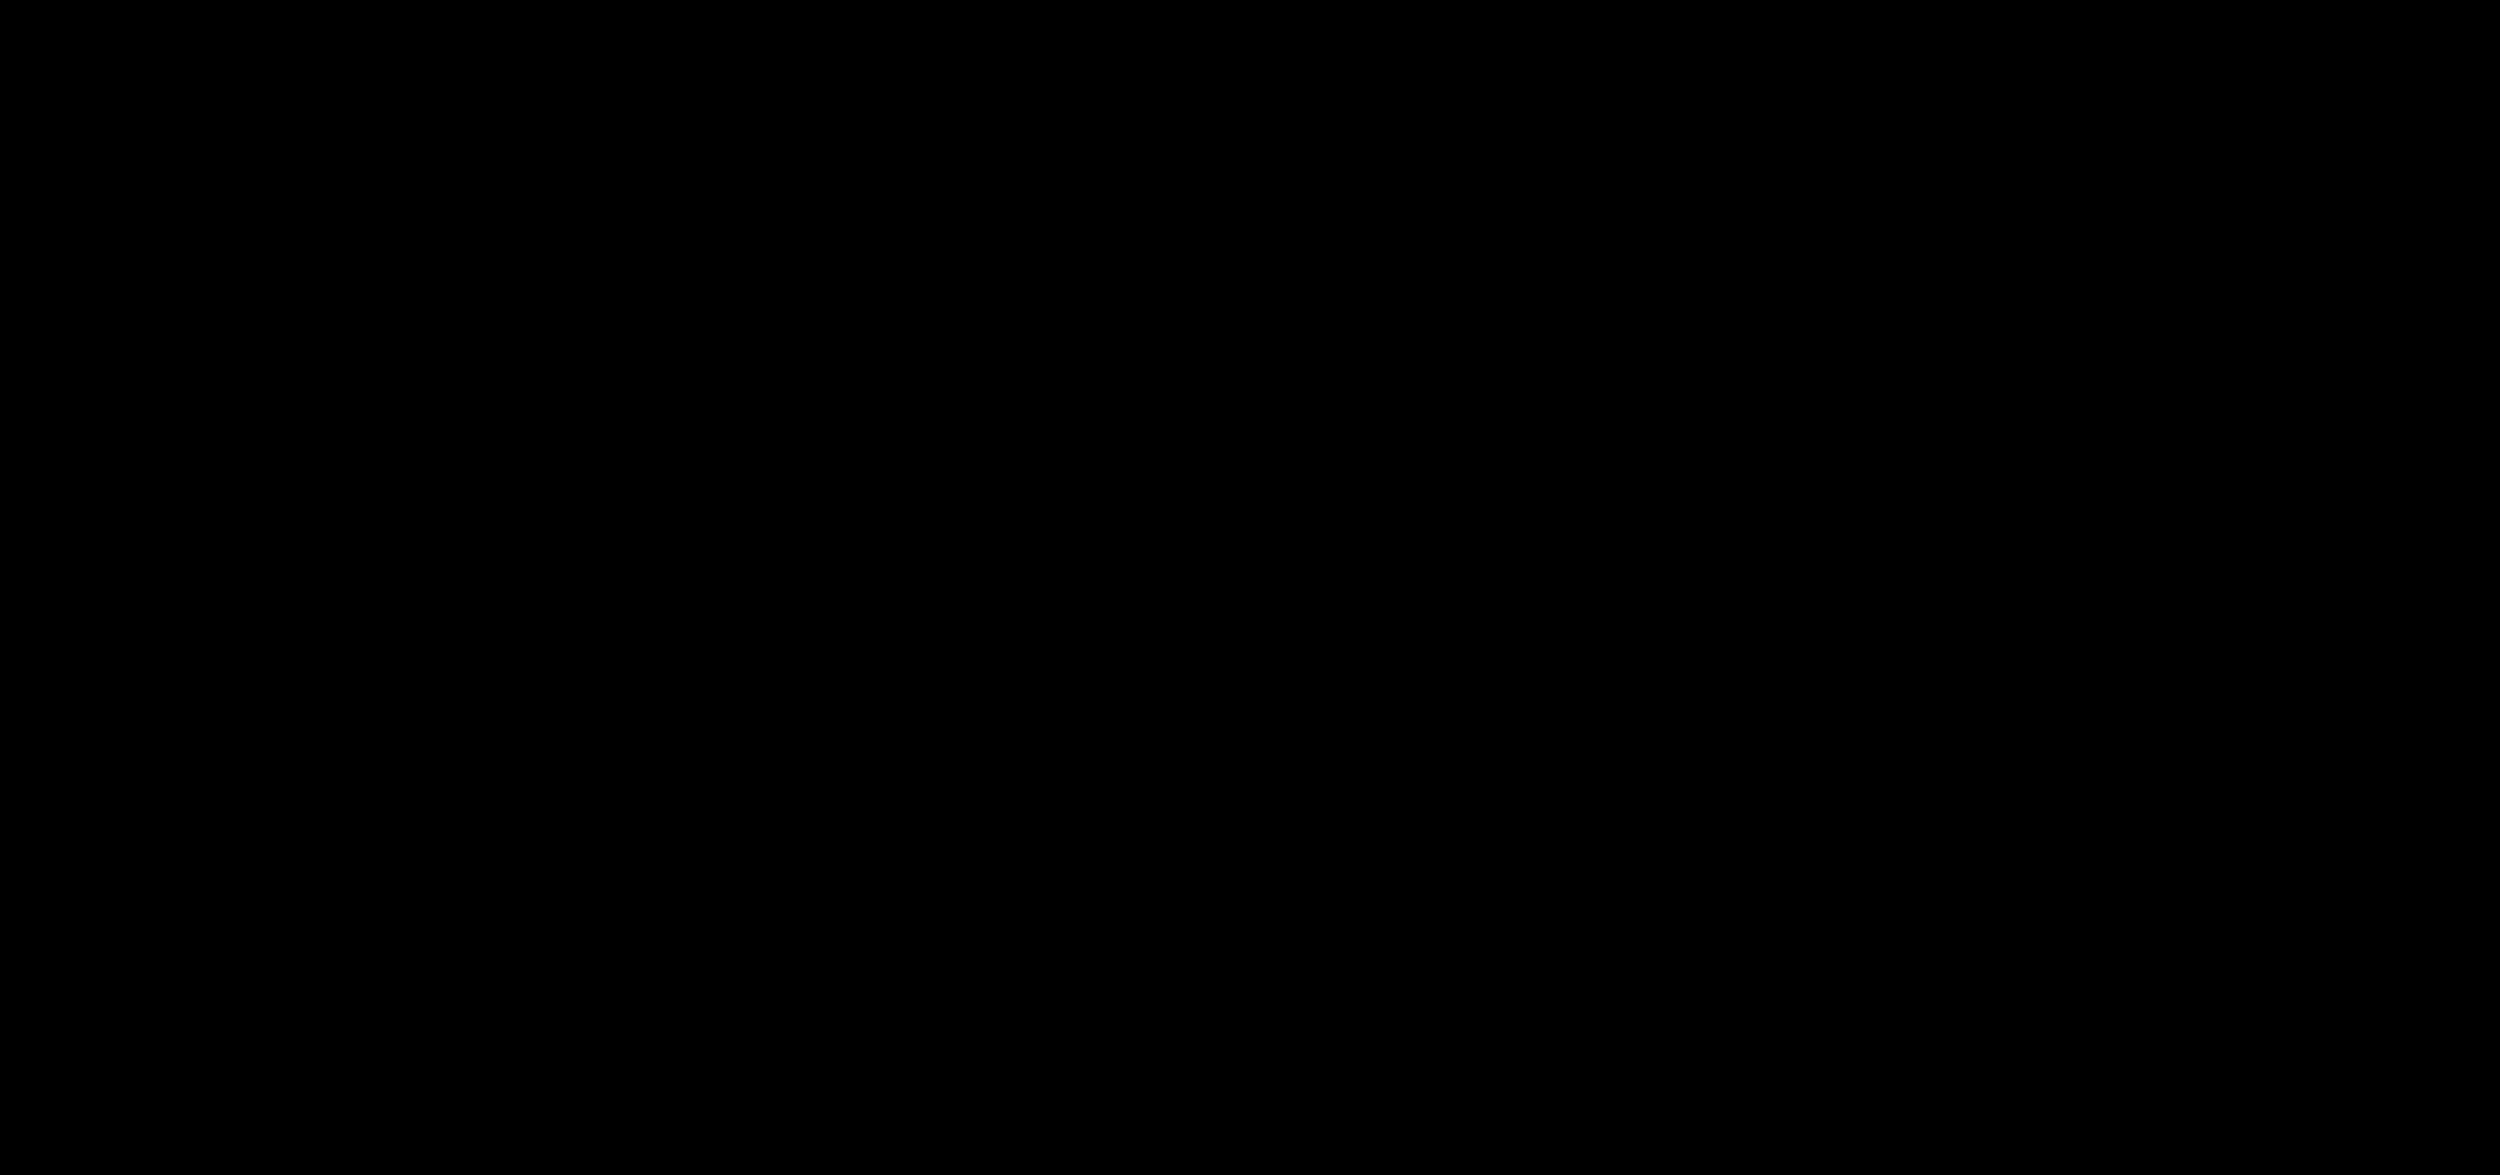 infinity proof nrg logo.png